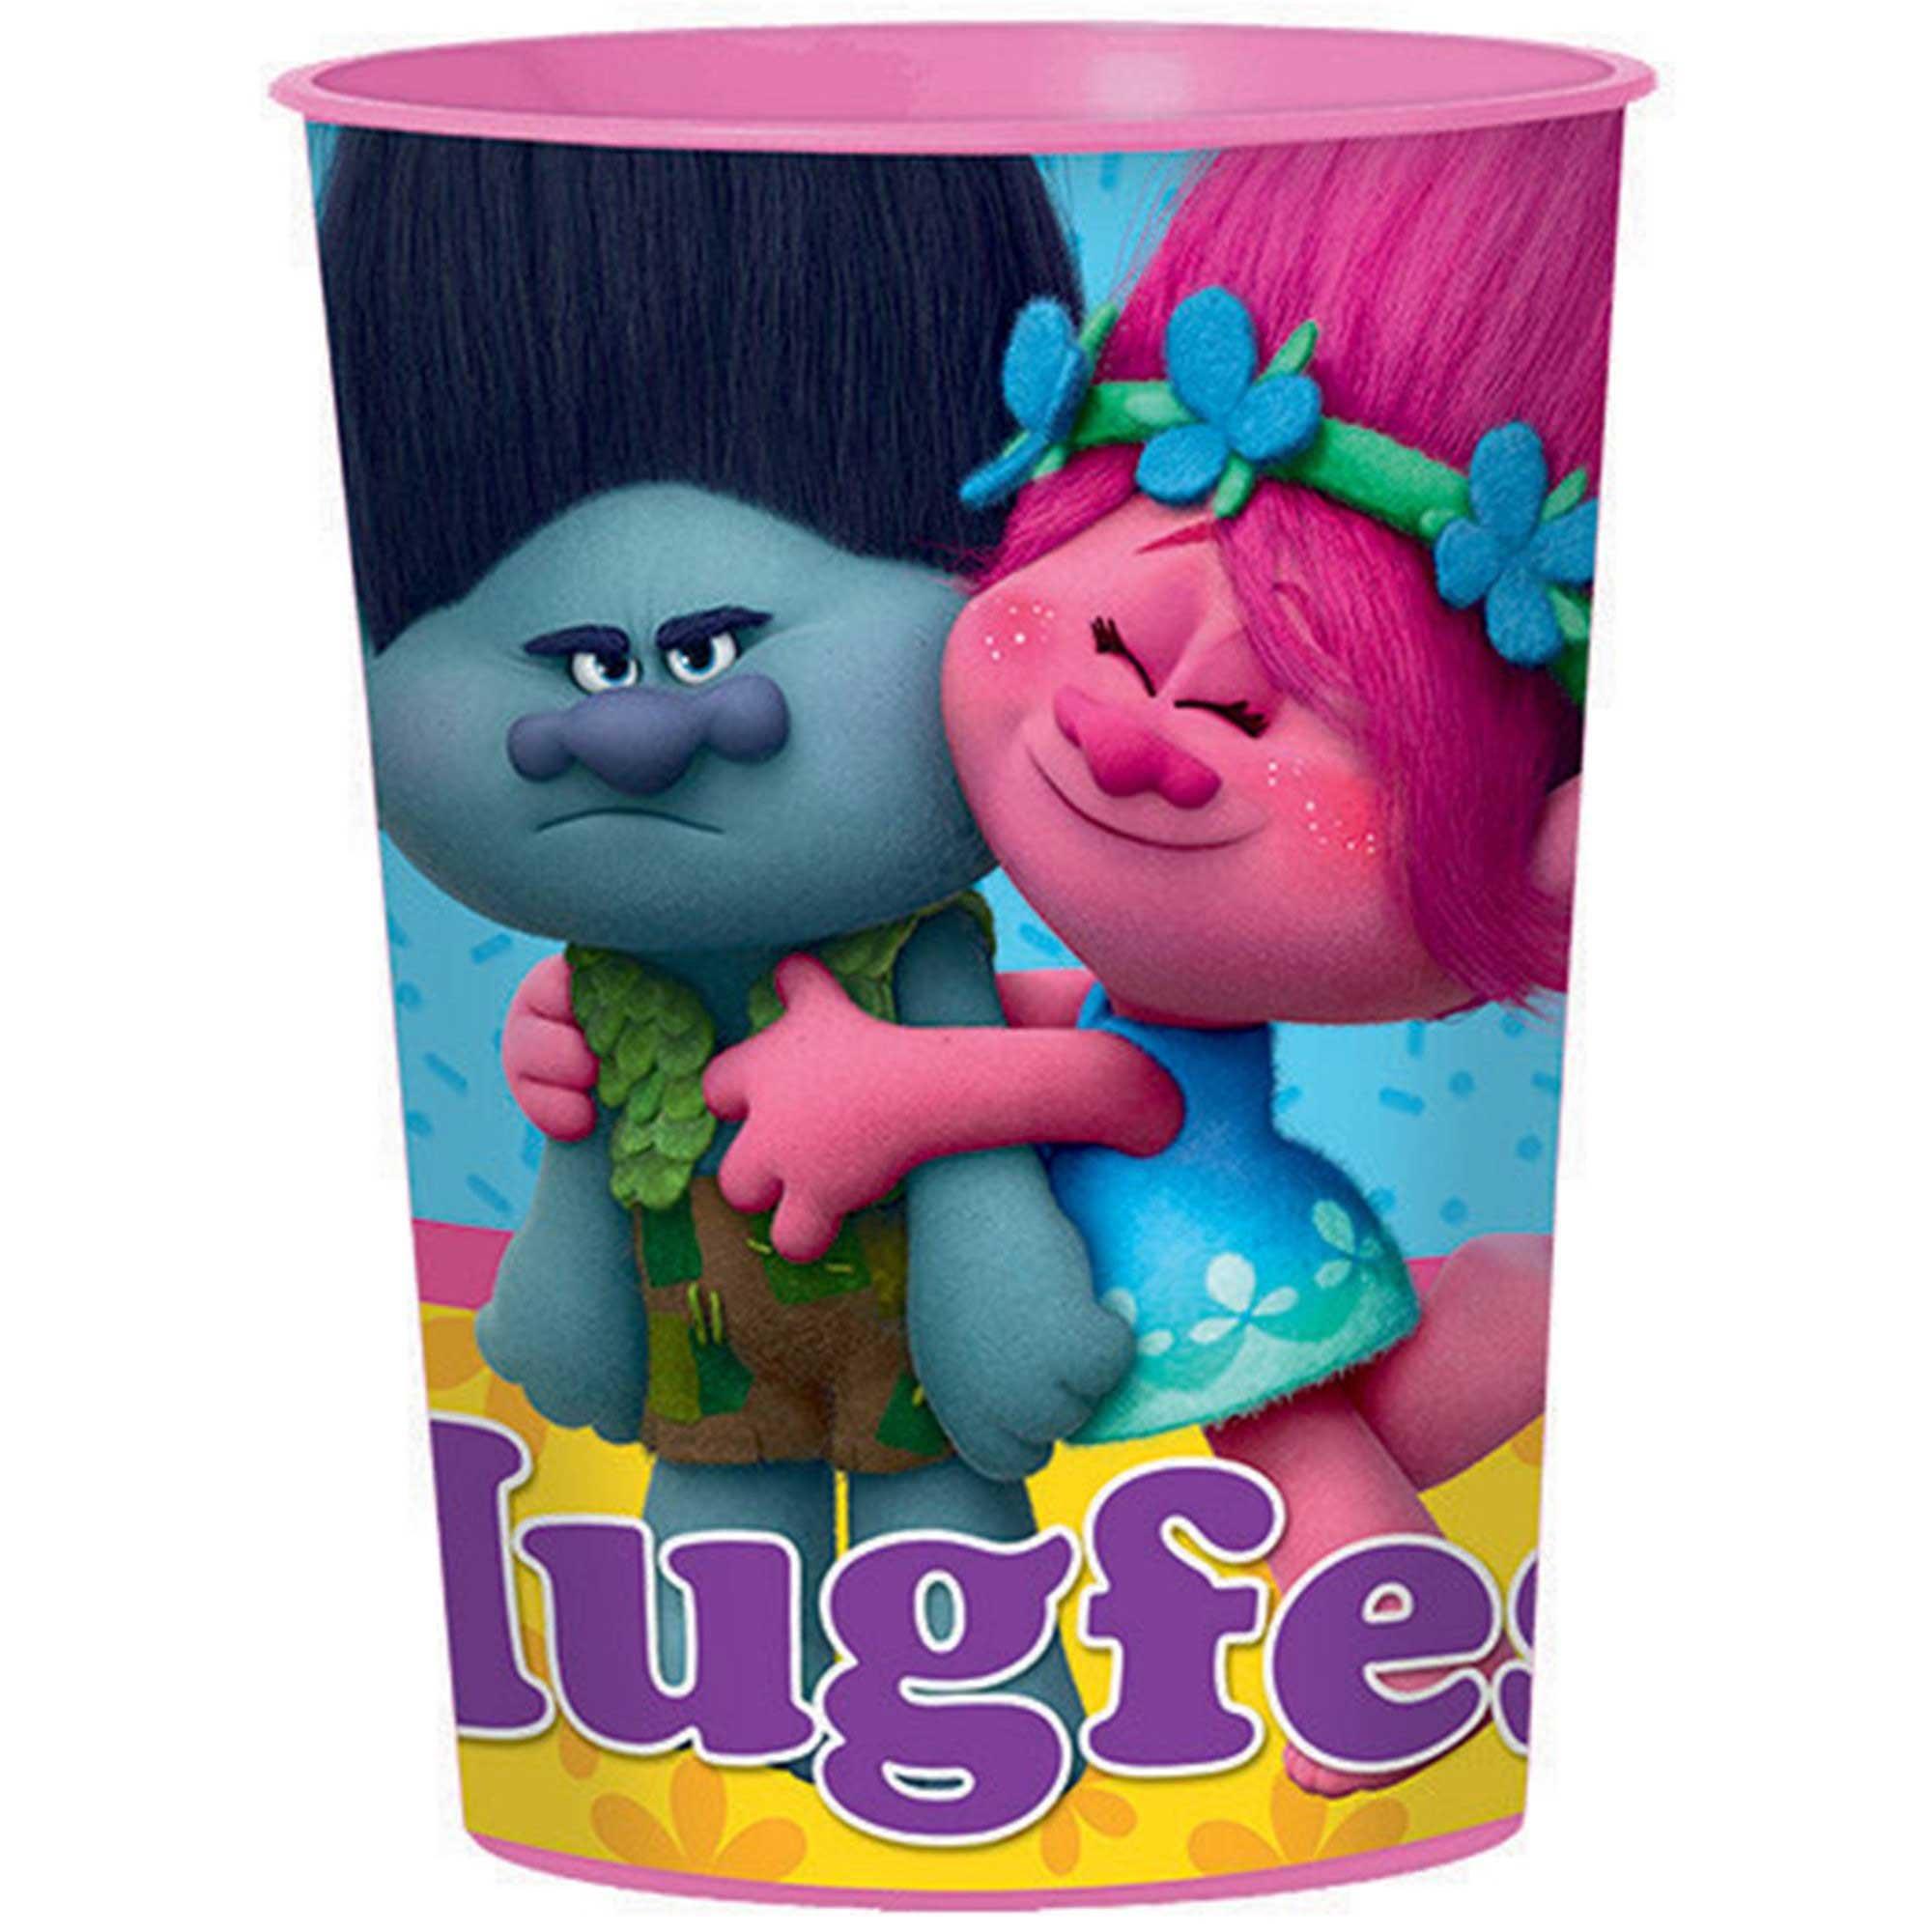 Trolls 473ml Favor Cup - Plastic